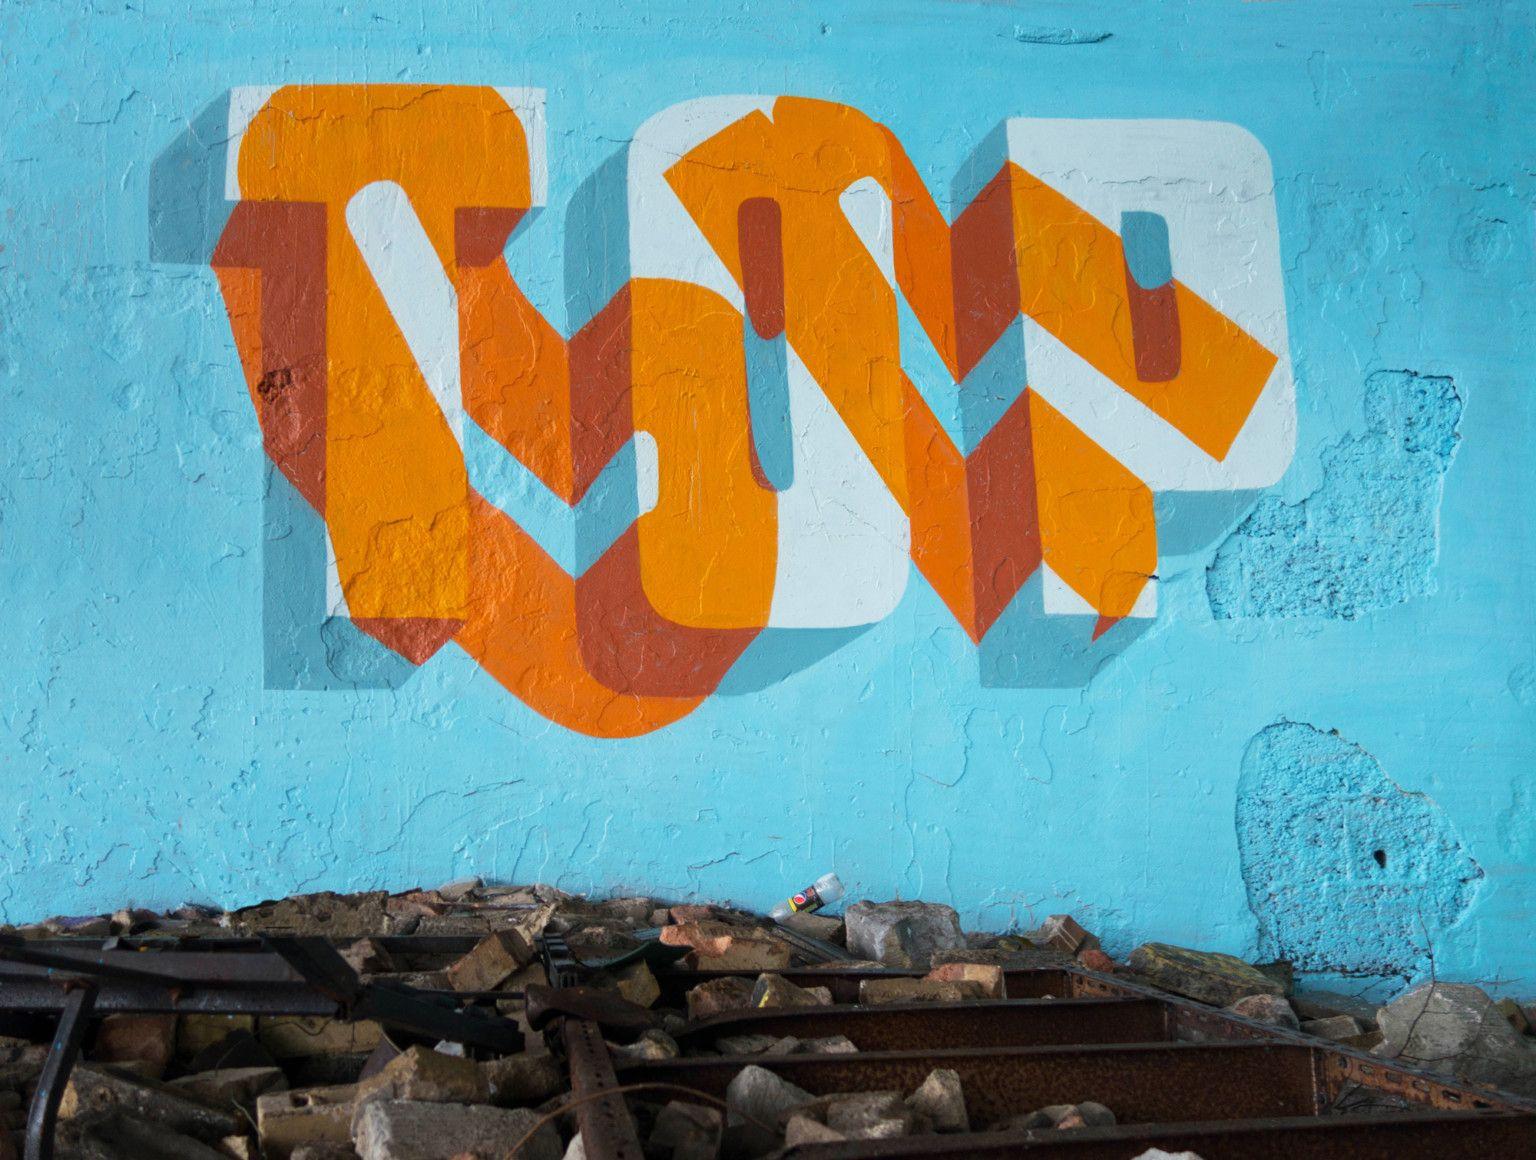 Typography street art news street artists graffiti lettering graffiti art typography letters